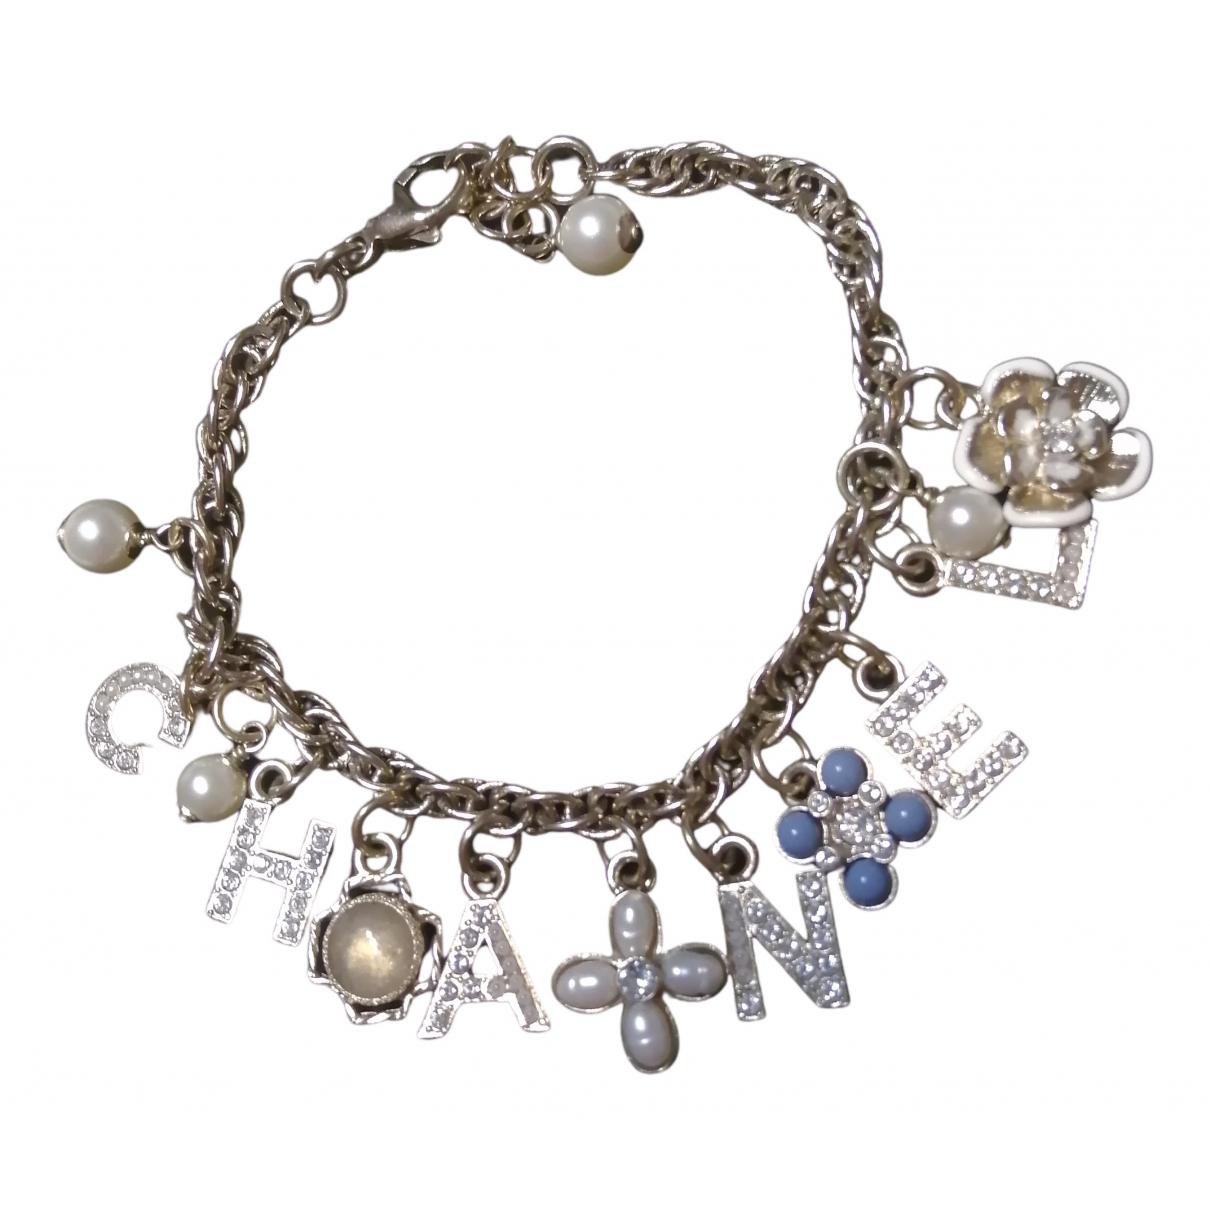 Chanel CHANEL Armband in  Metallic Metall